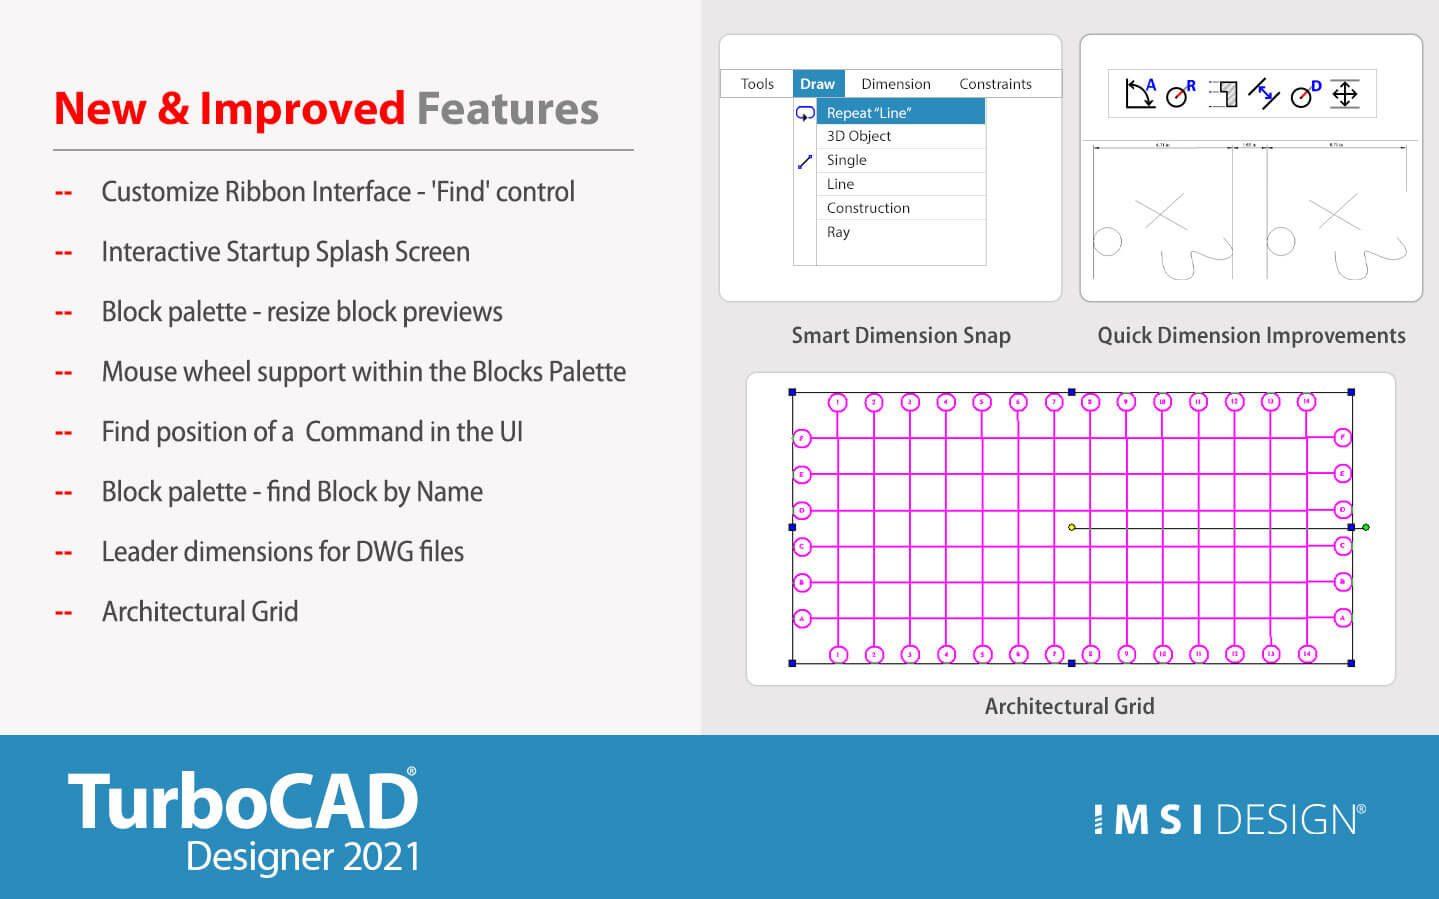 What's New in TurboCAD Designer